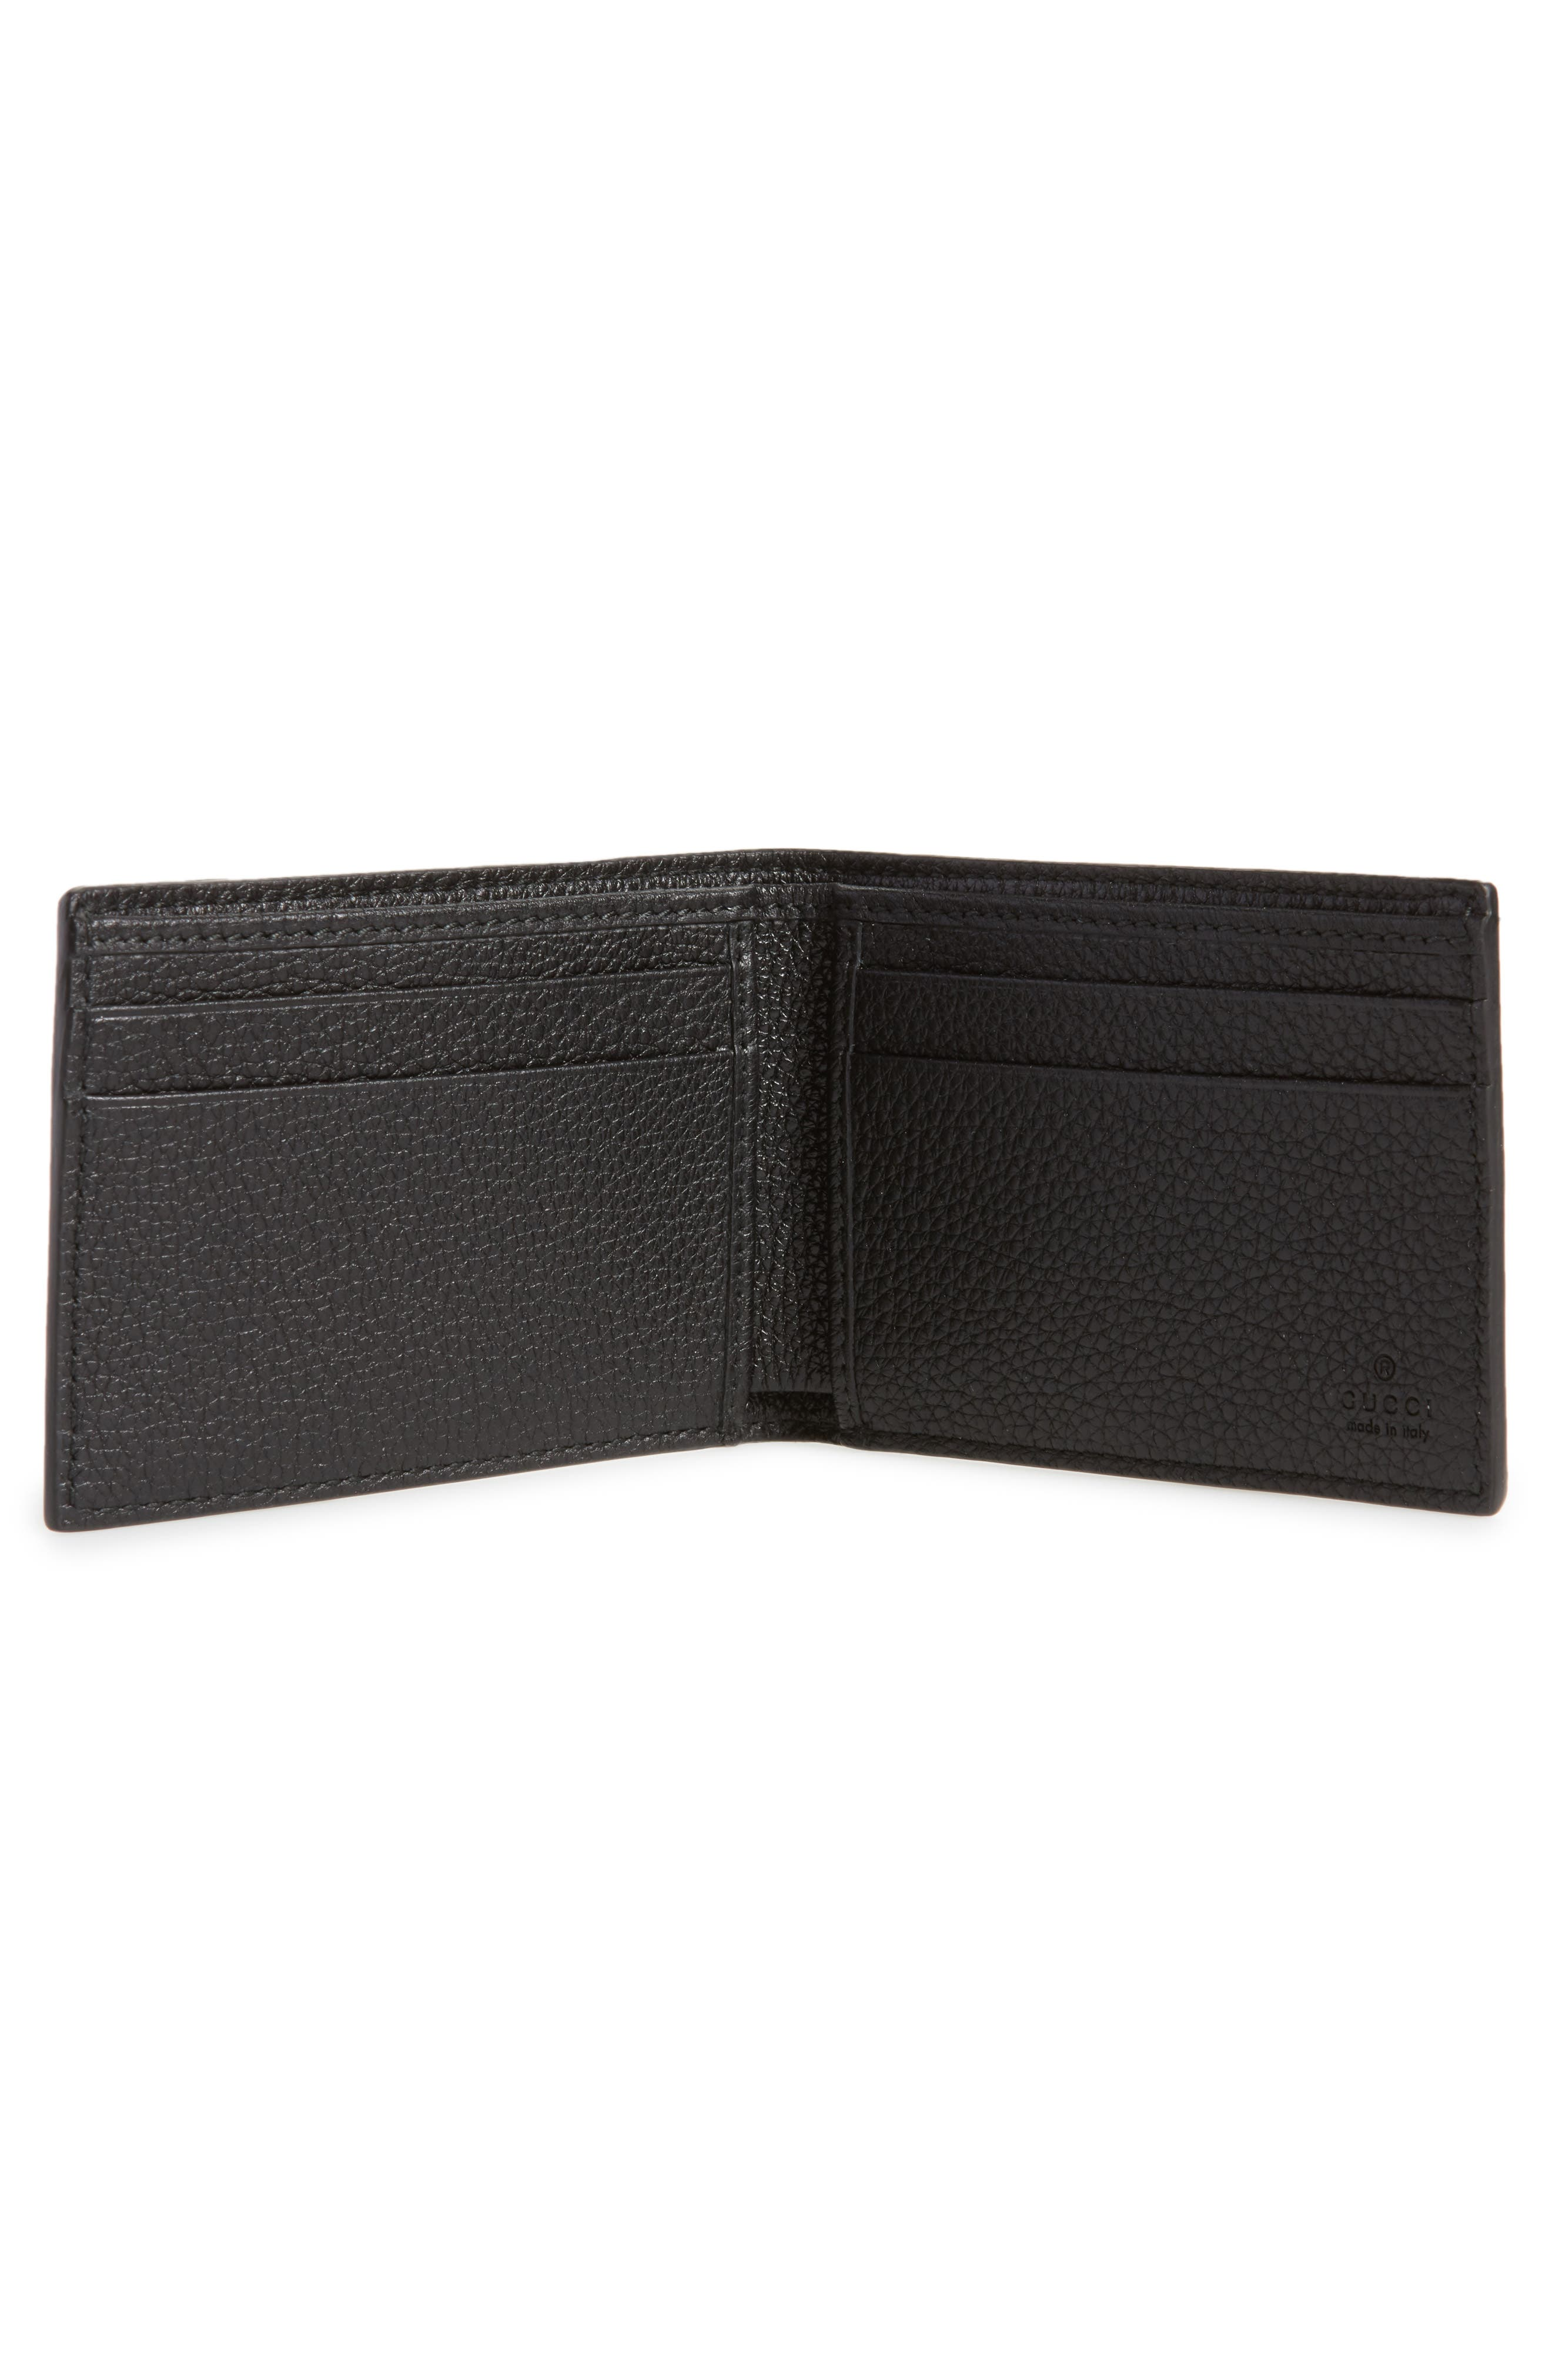 Bifold Wallet,                             Alternate thumbnail 2, color,                             Black